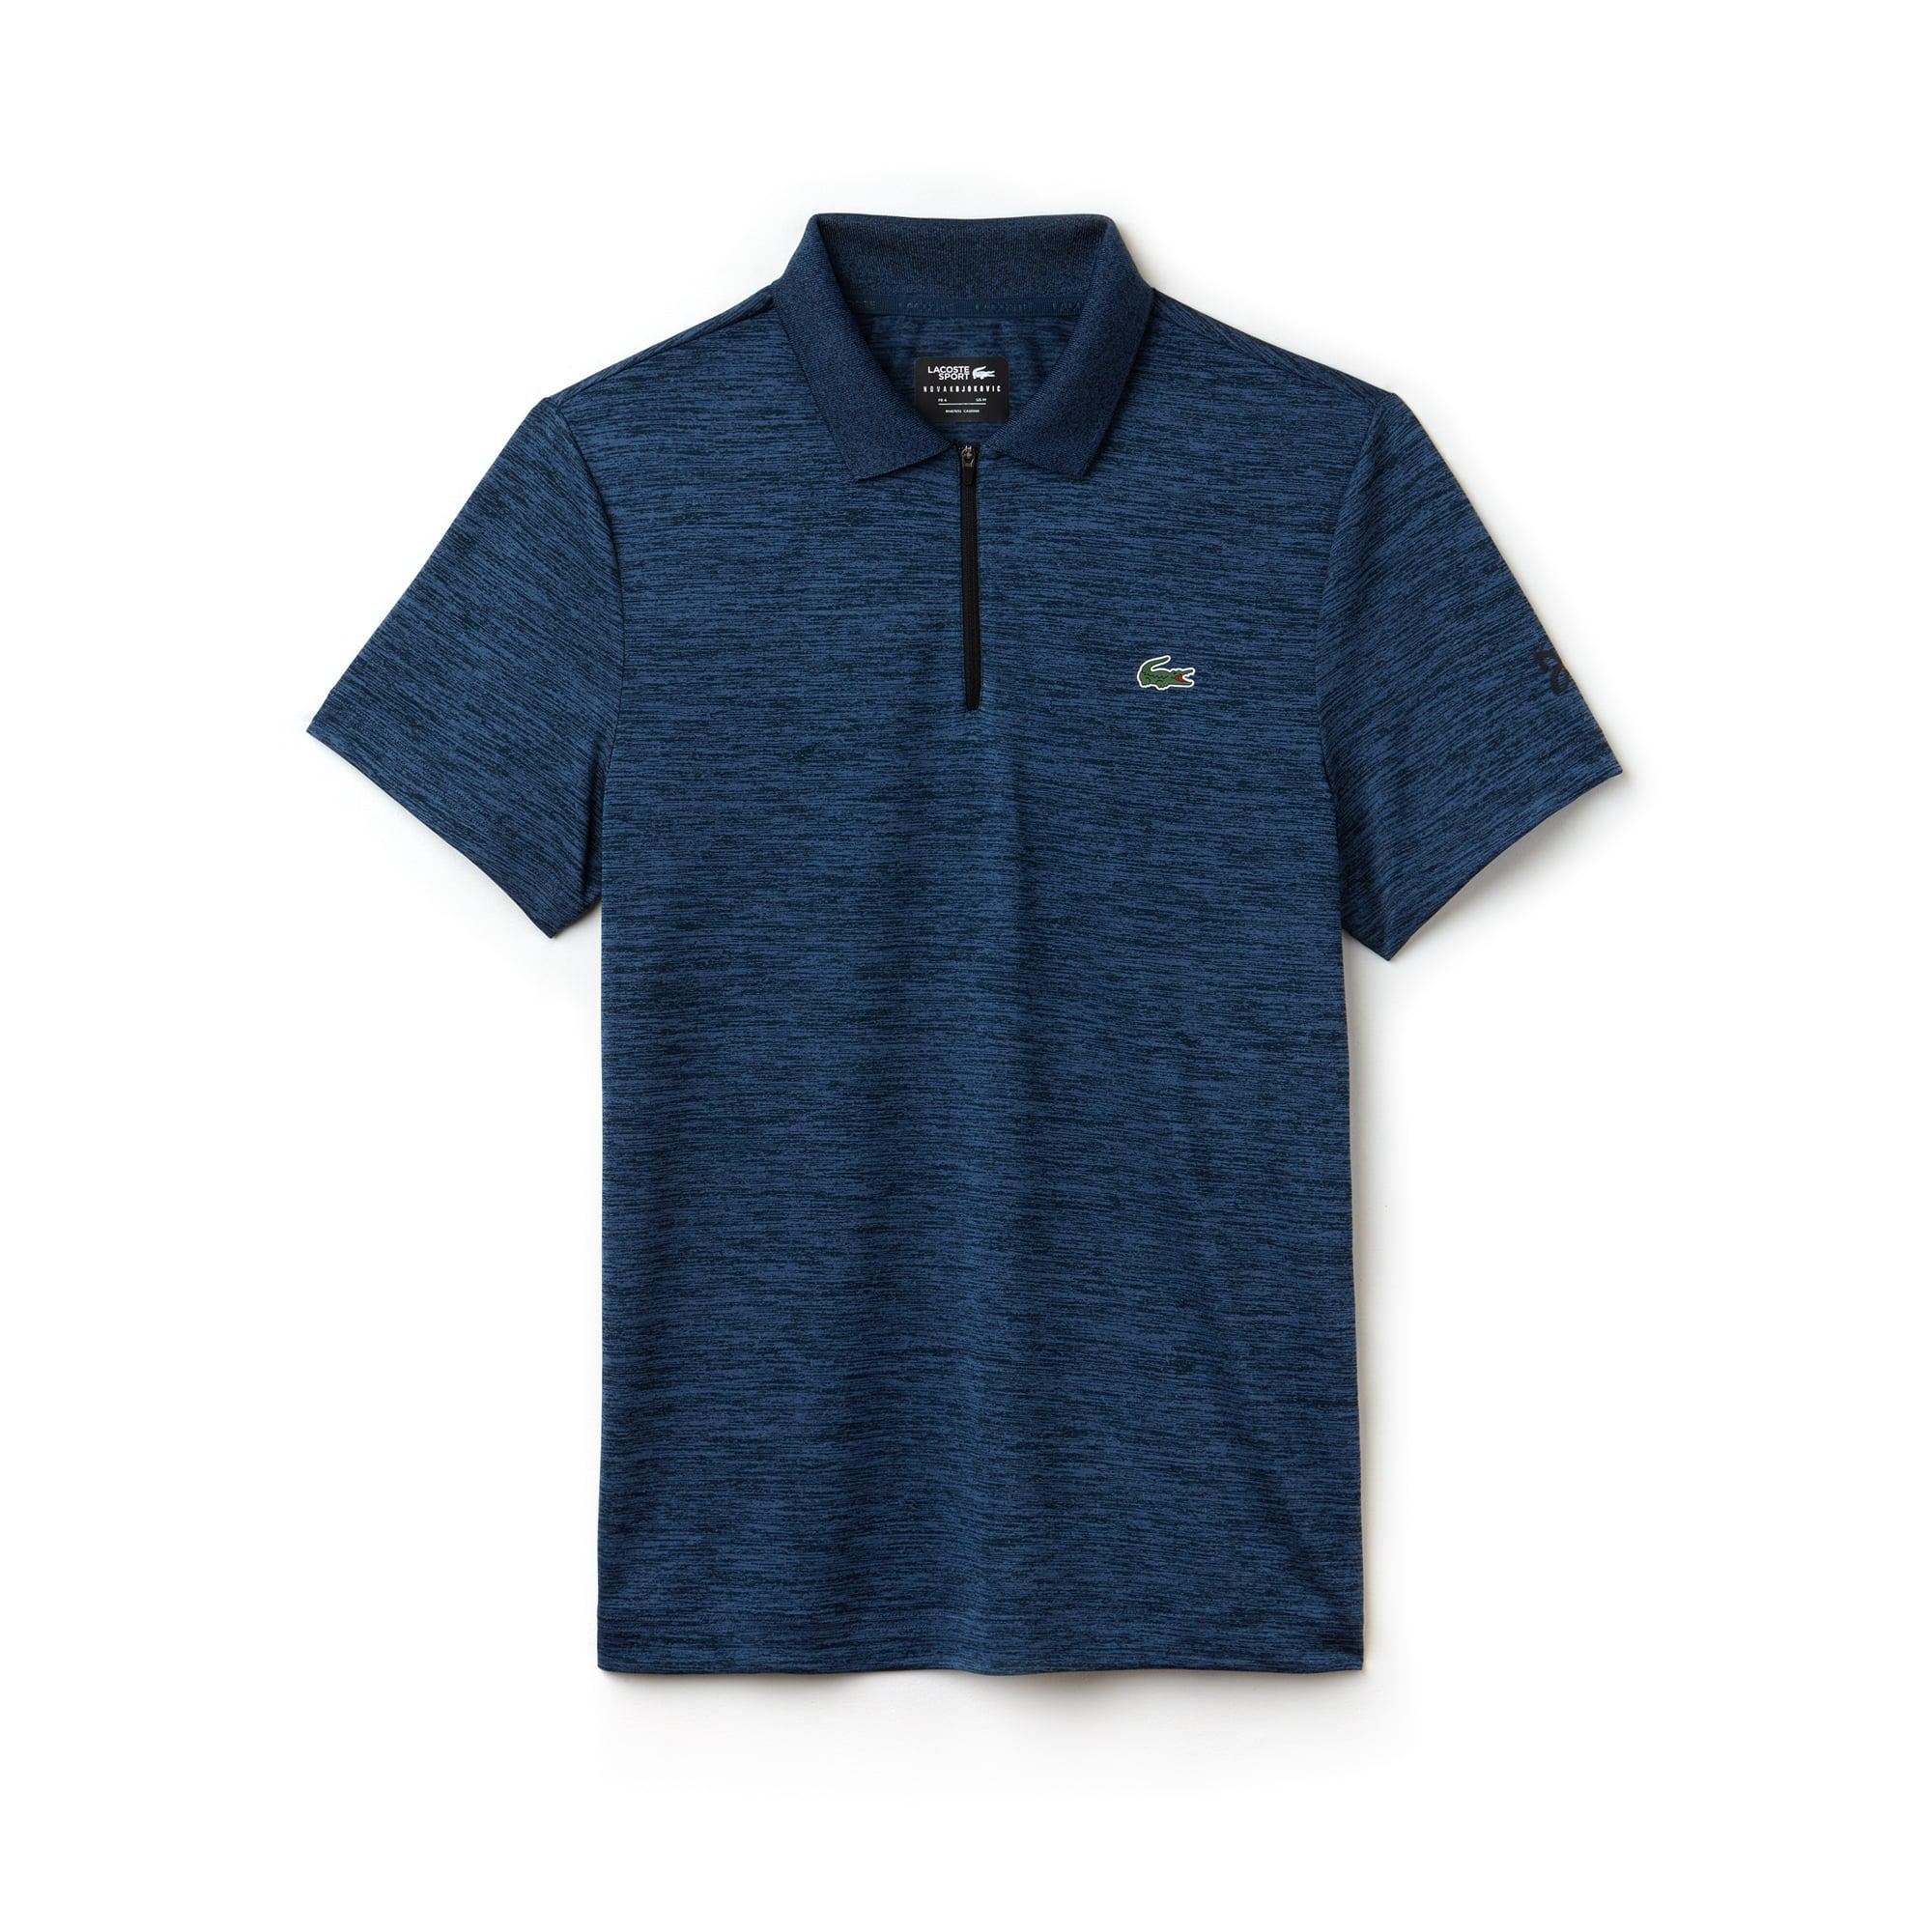 Men's Lacoste SPORT NOVAK DJOKOVIC-OFF COURT COLLECTION Flecked Technical Jersey Polo Shirt